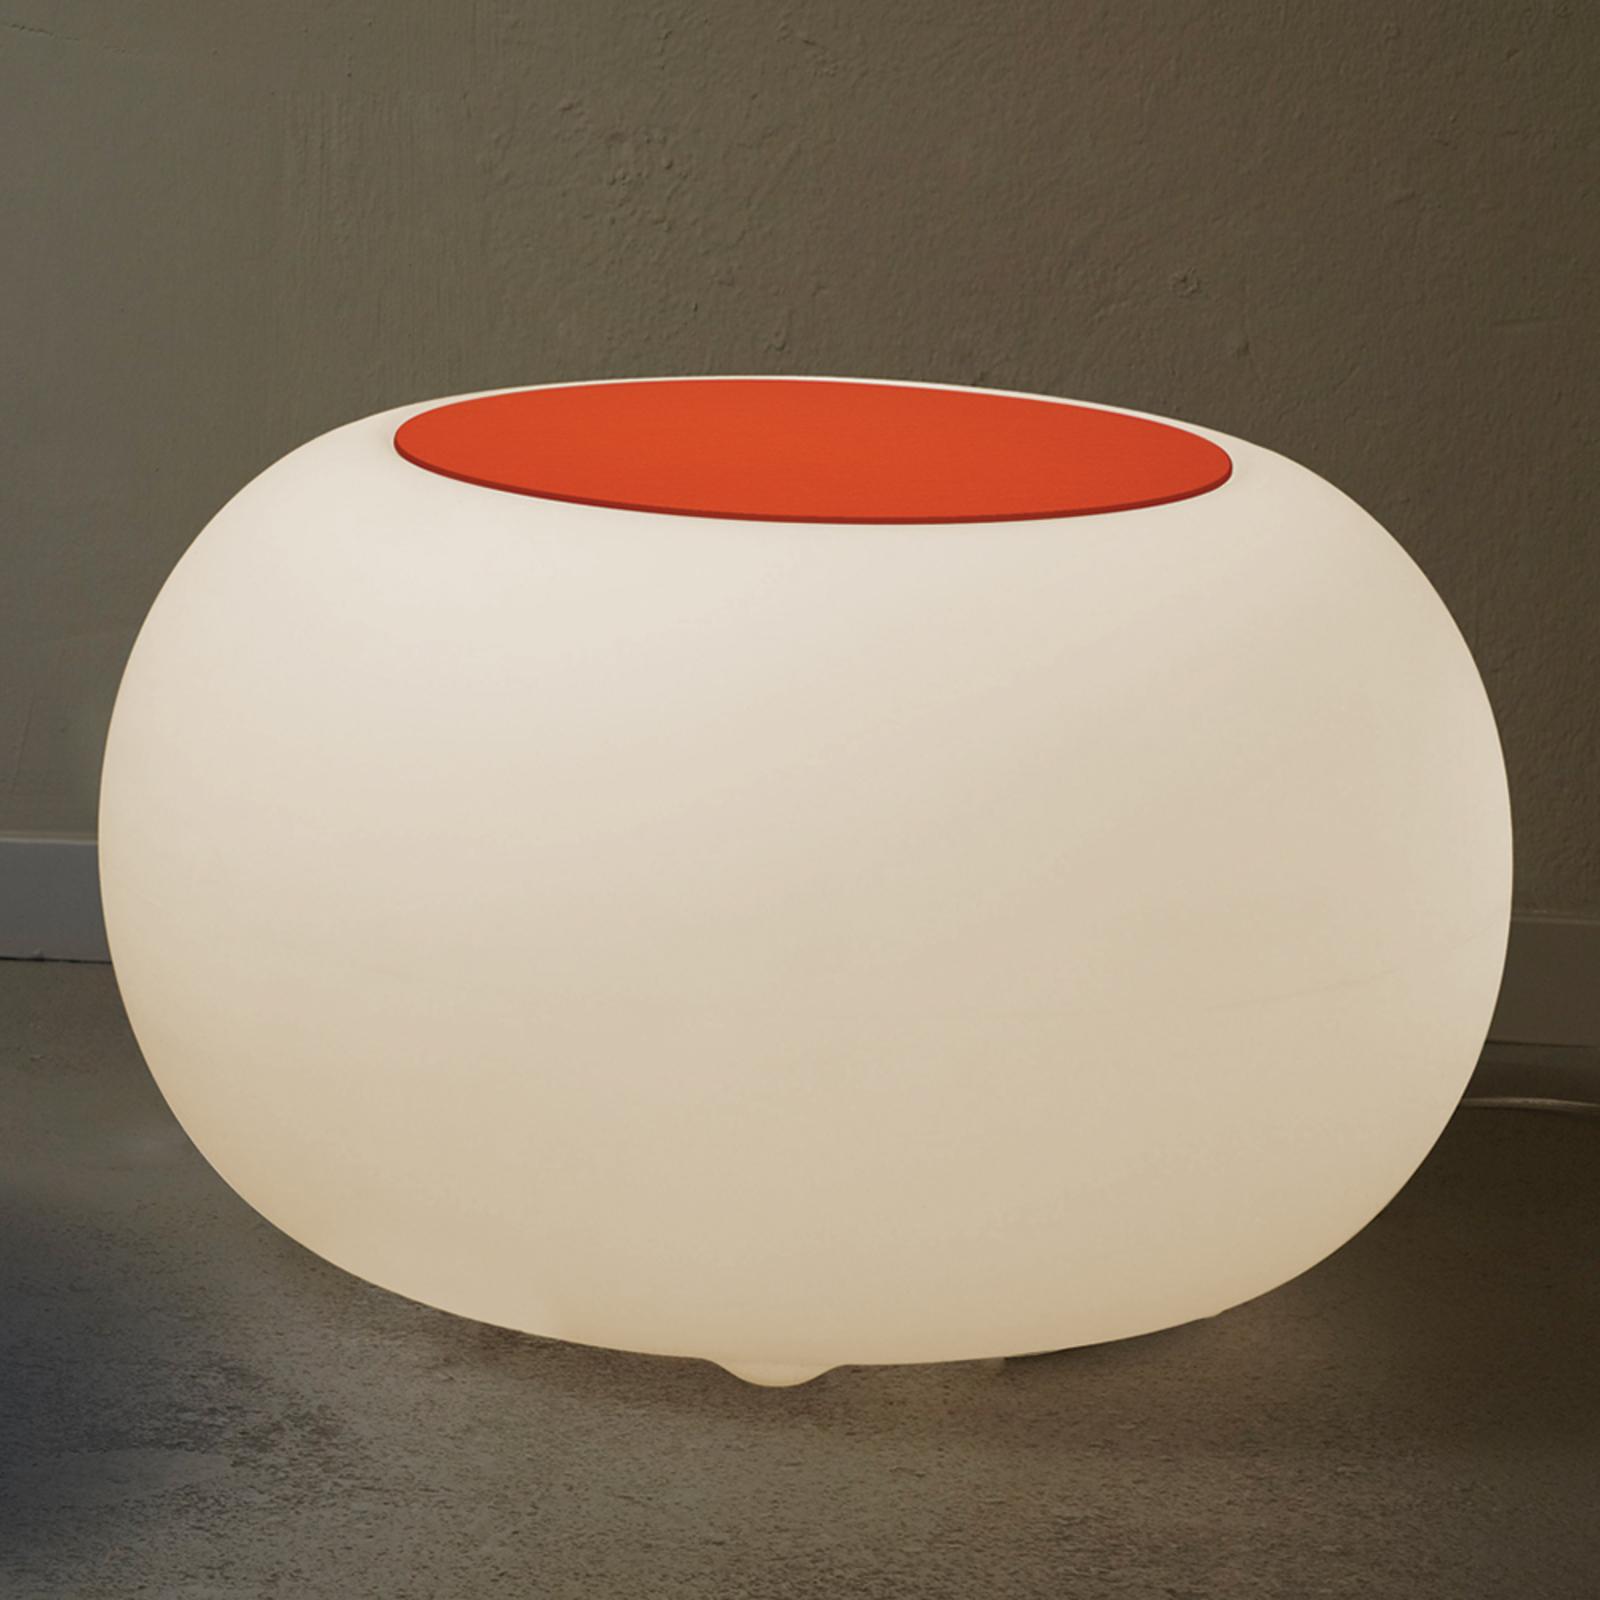 Tisch BUBBLE Indoor LED E27-Lampe + Filz orange